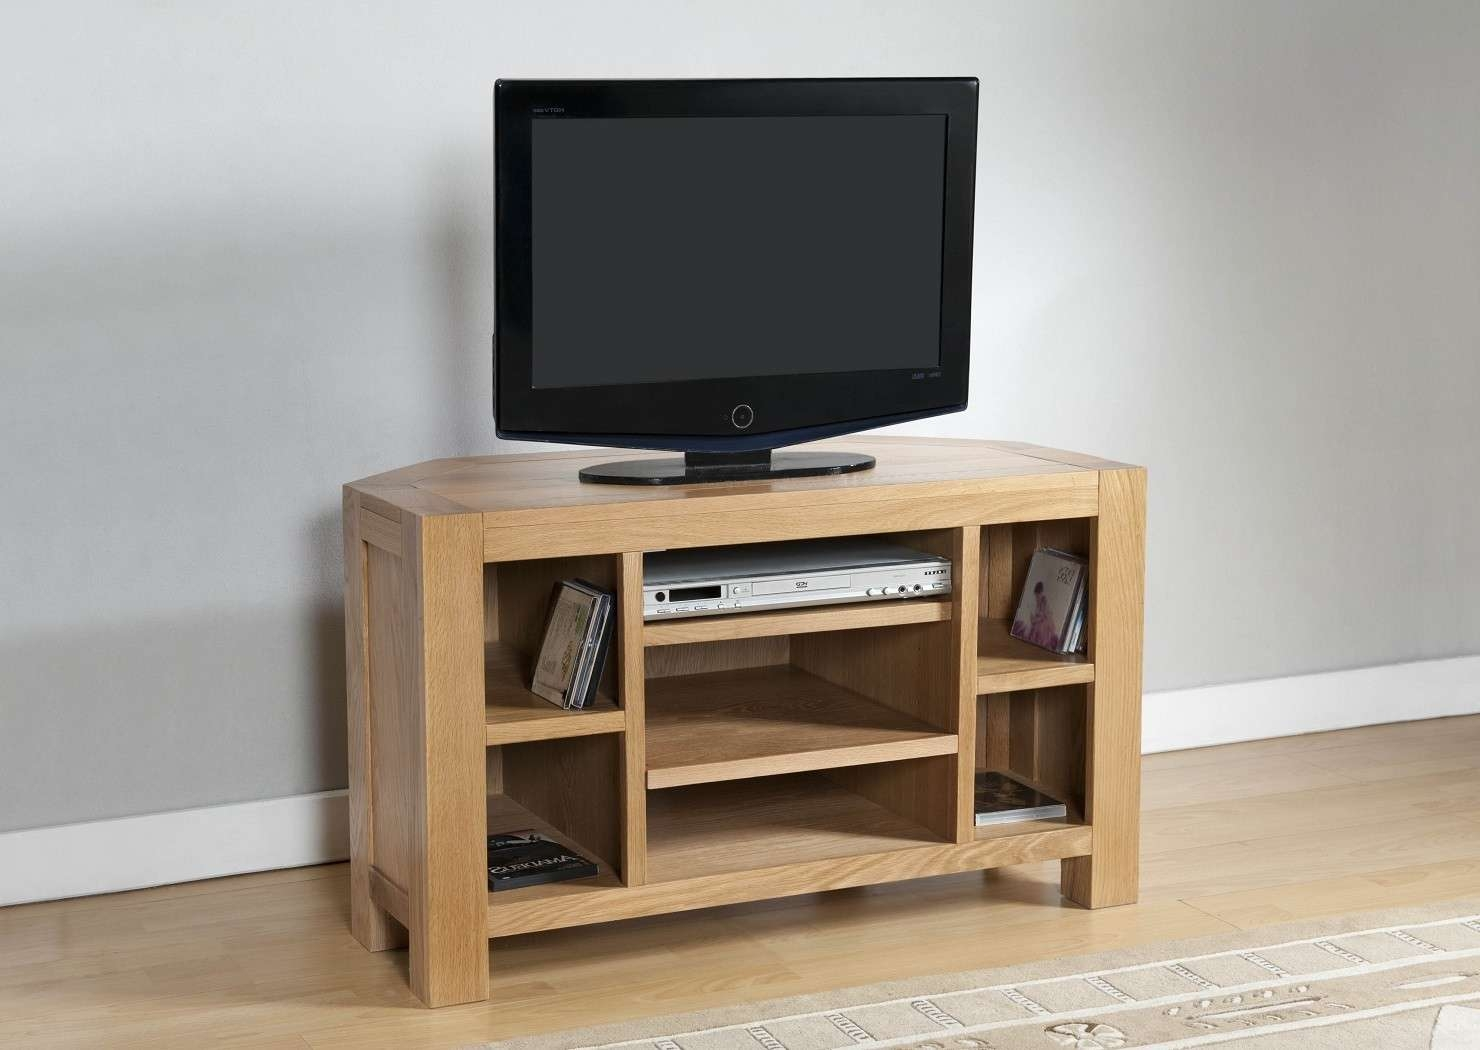 Aylesbury Contemporary Light Oak Corner Tv Unit | Oak Furniture Uk For Light Oak Corner Tv Cabinets (View 3 of 20)